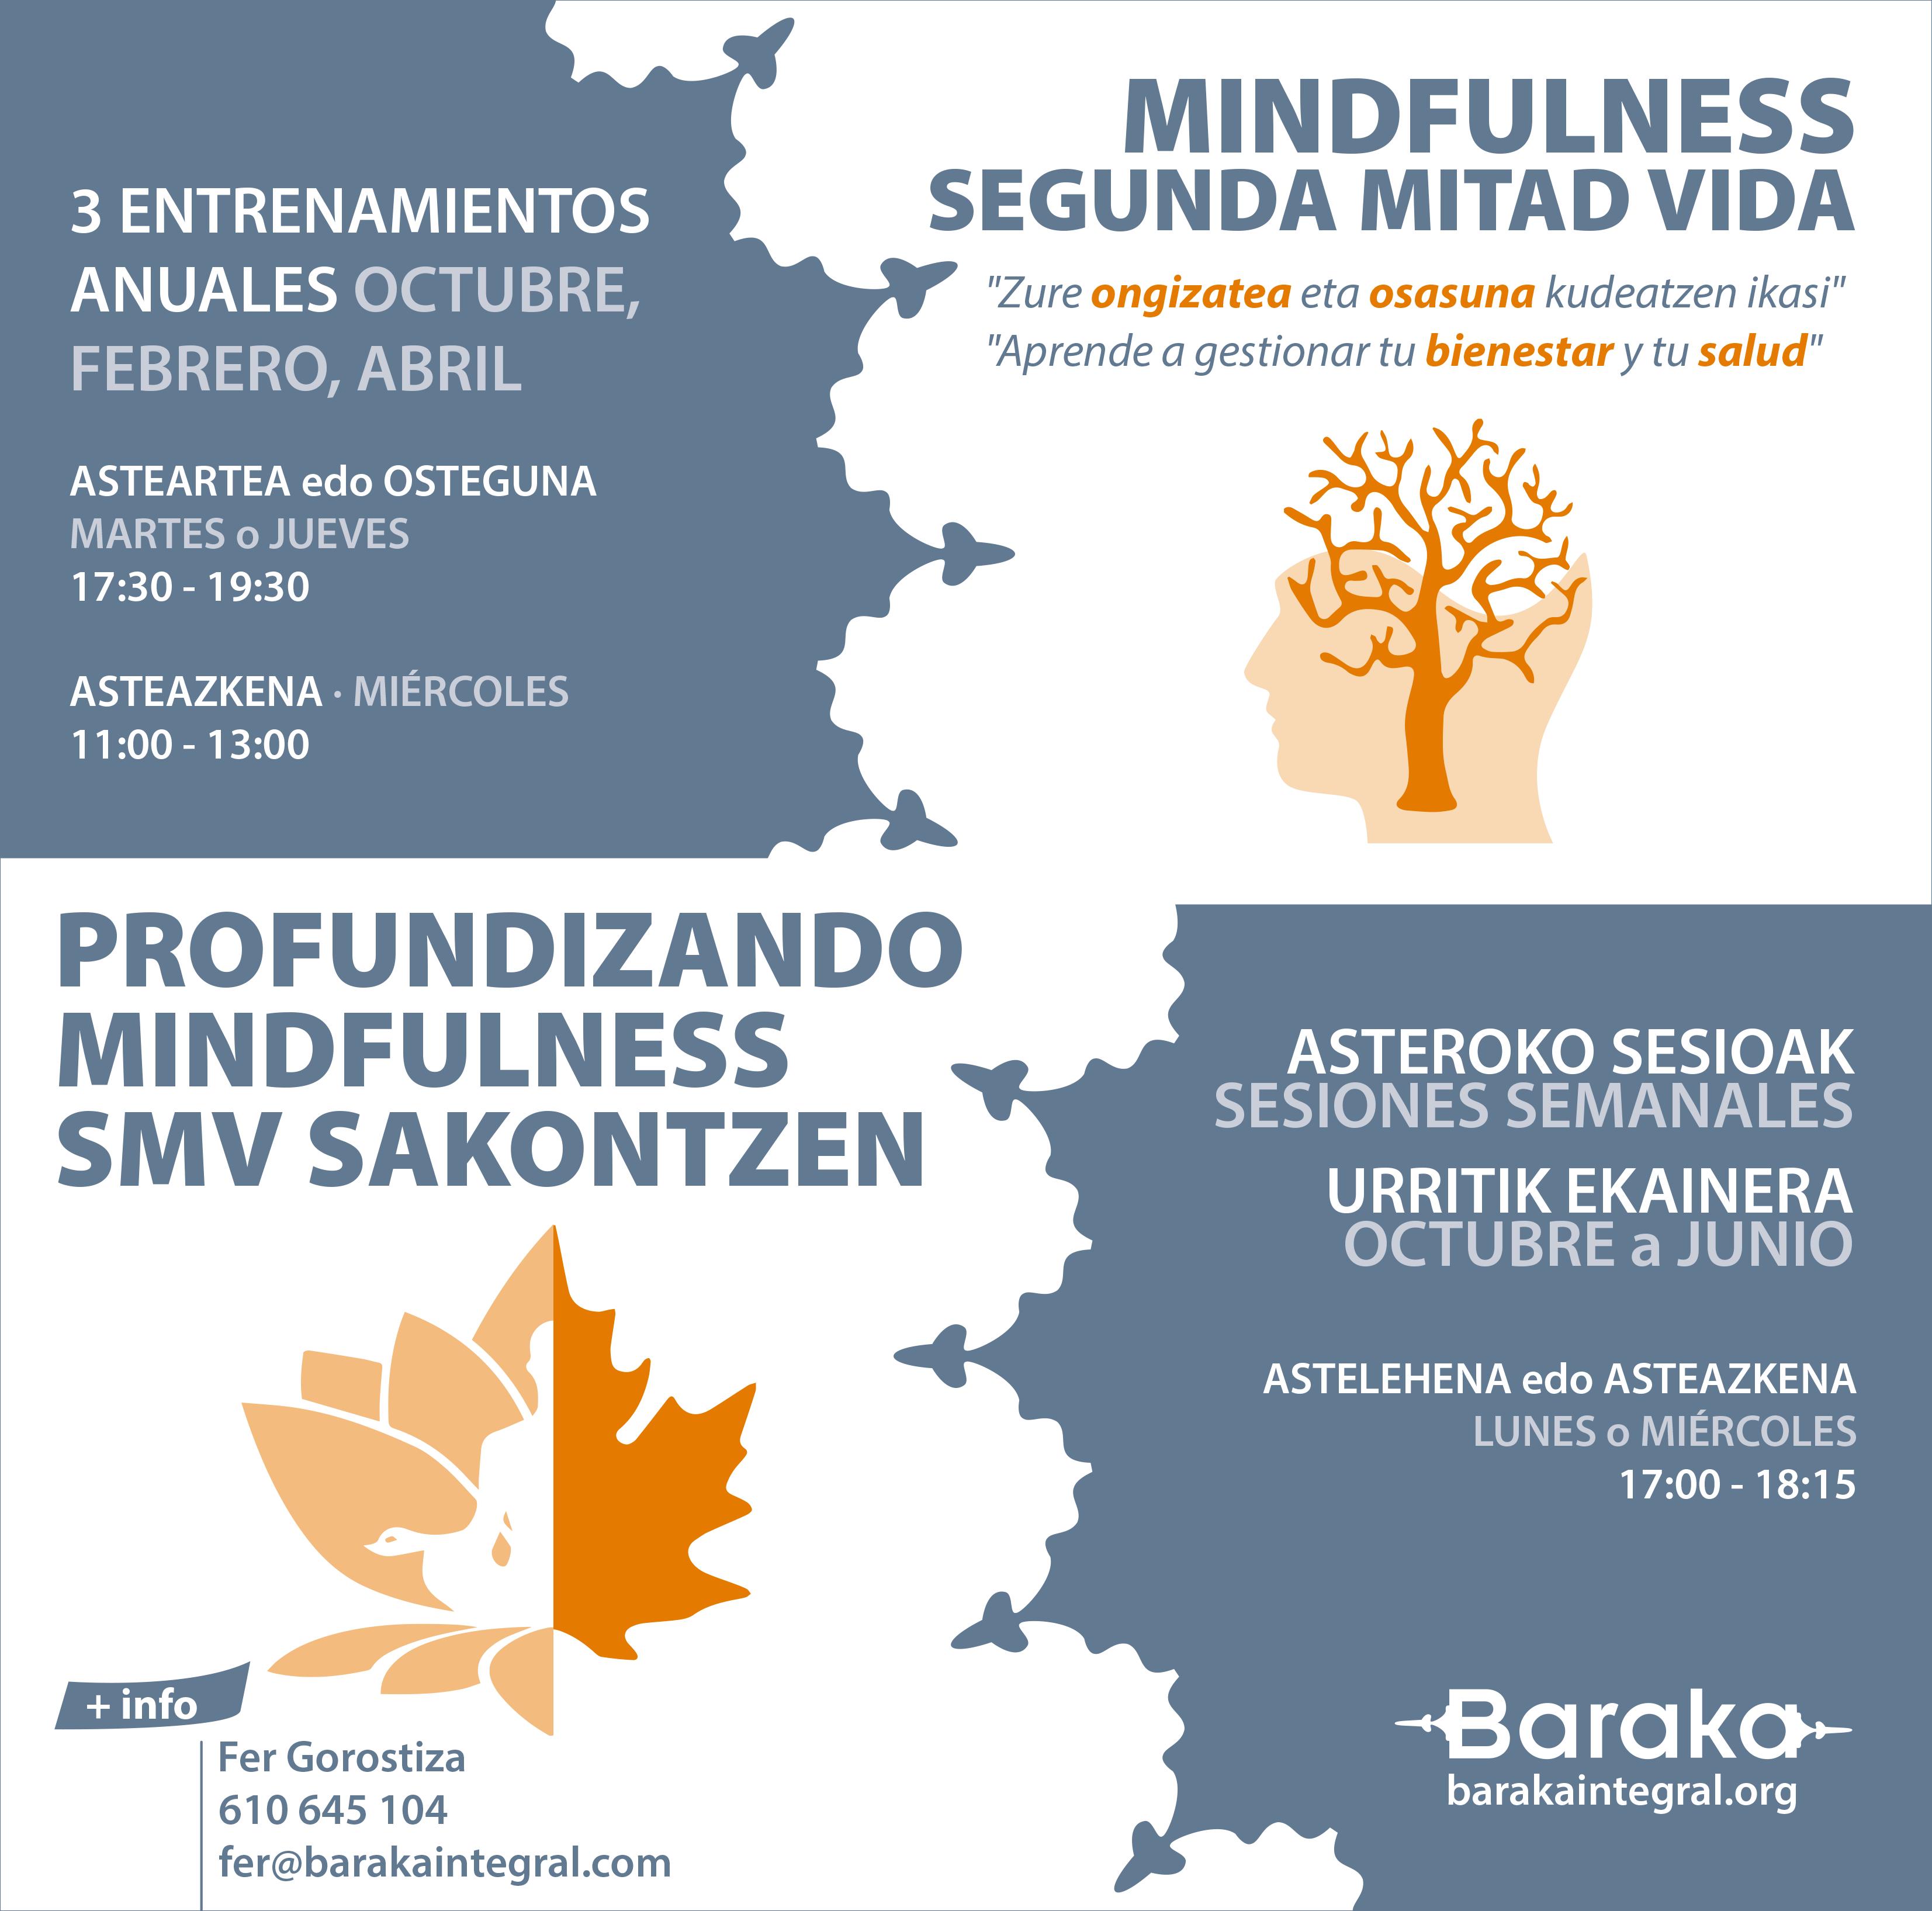 Mindfulness_SMV-copia